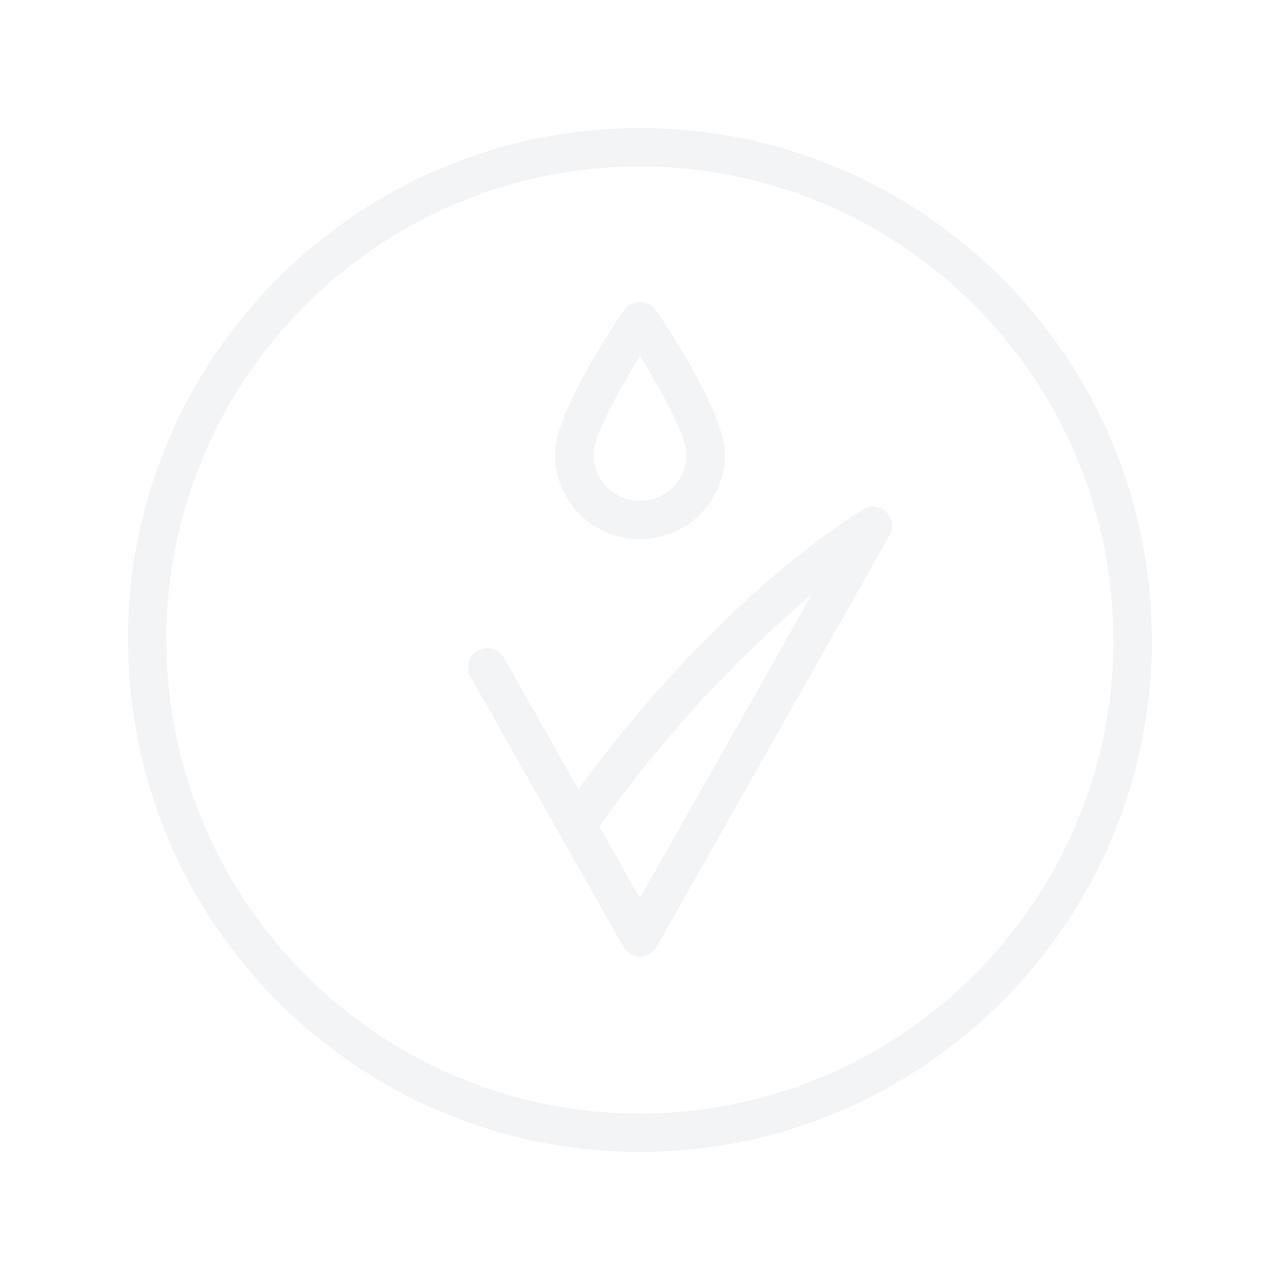 ORGANIC SHOP Lavender & Iris Shower Gel 280ml